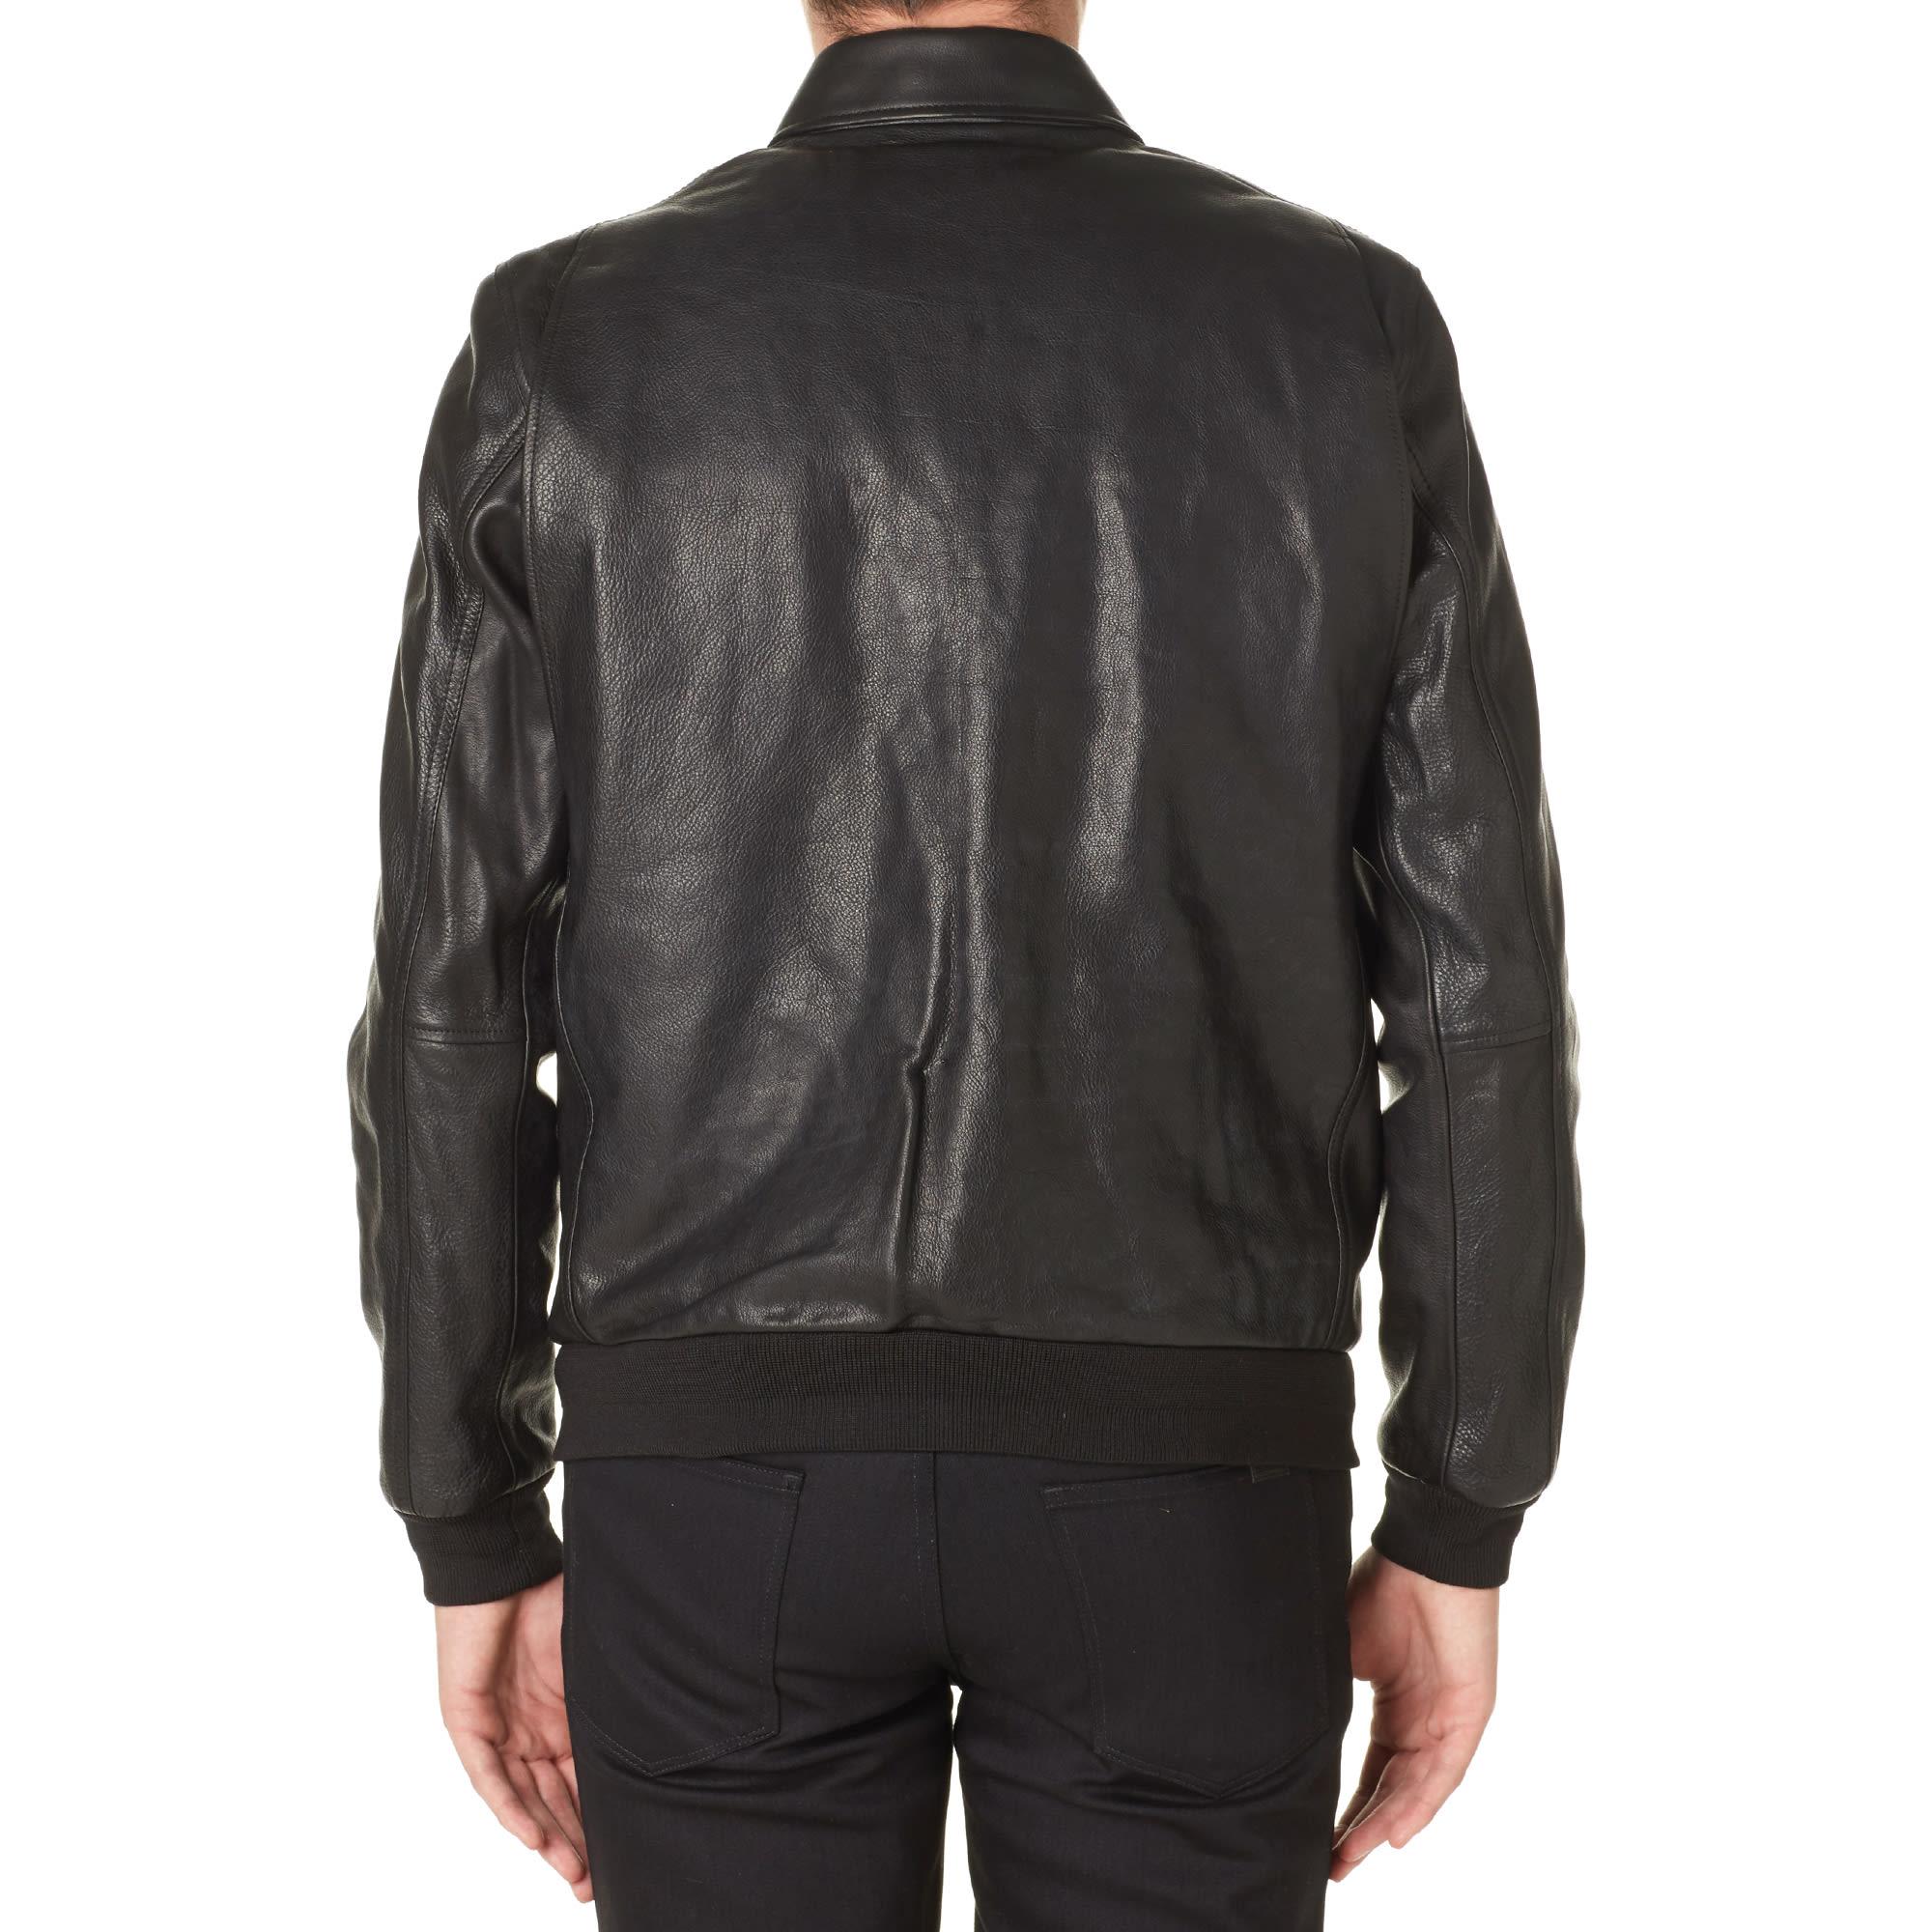 b4d75d2fed110 Carhartt Detroit Leather Jacket Black